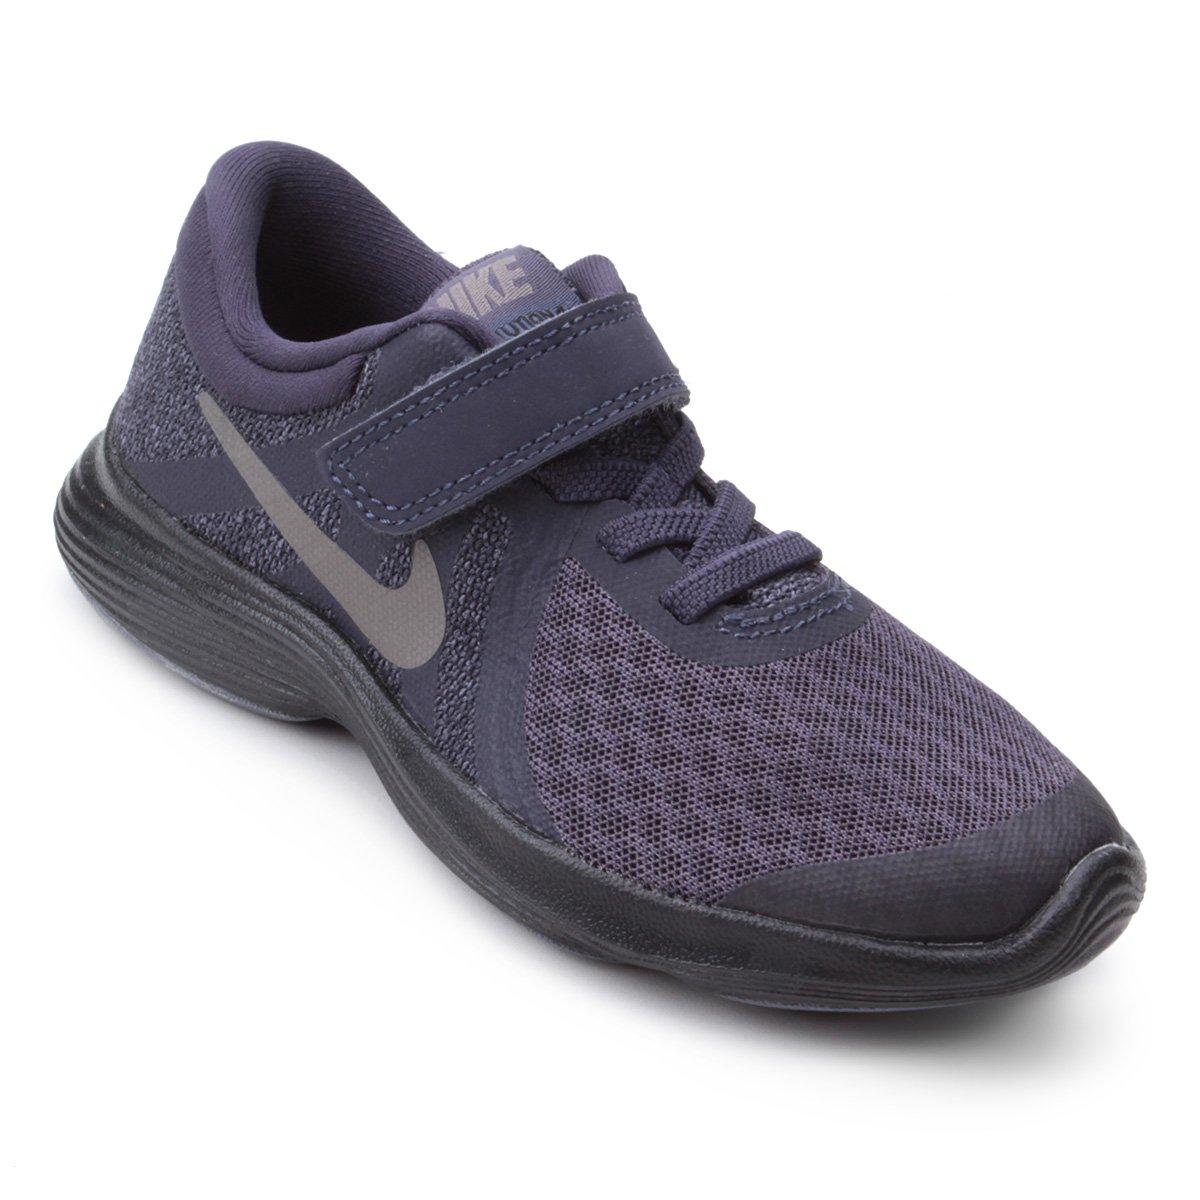 06312bb9a8 Tênis Infantil Nike Revolution 4 Masculino - Preto e Cinza - Compre ...